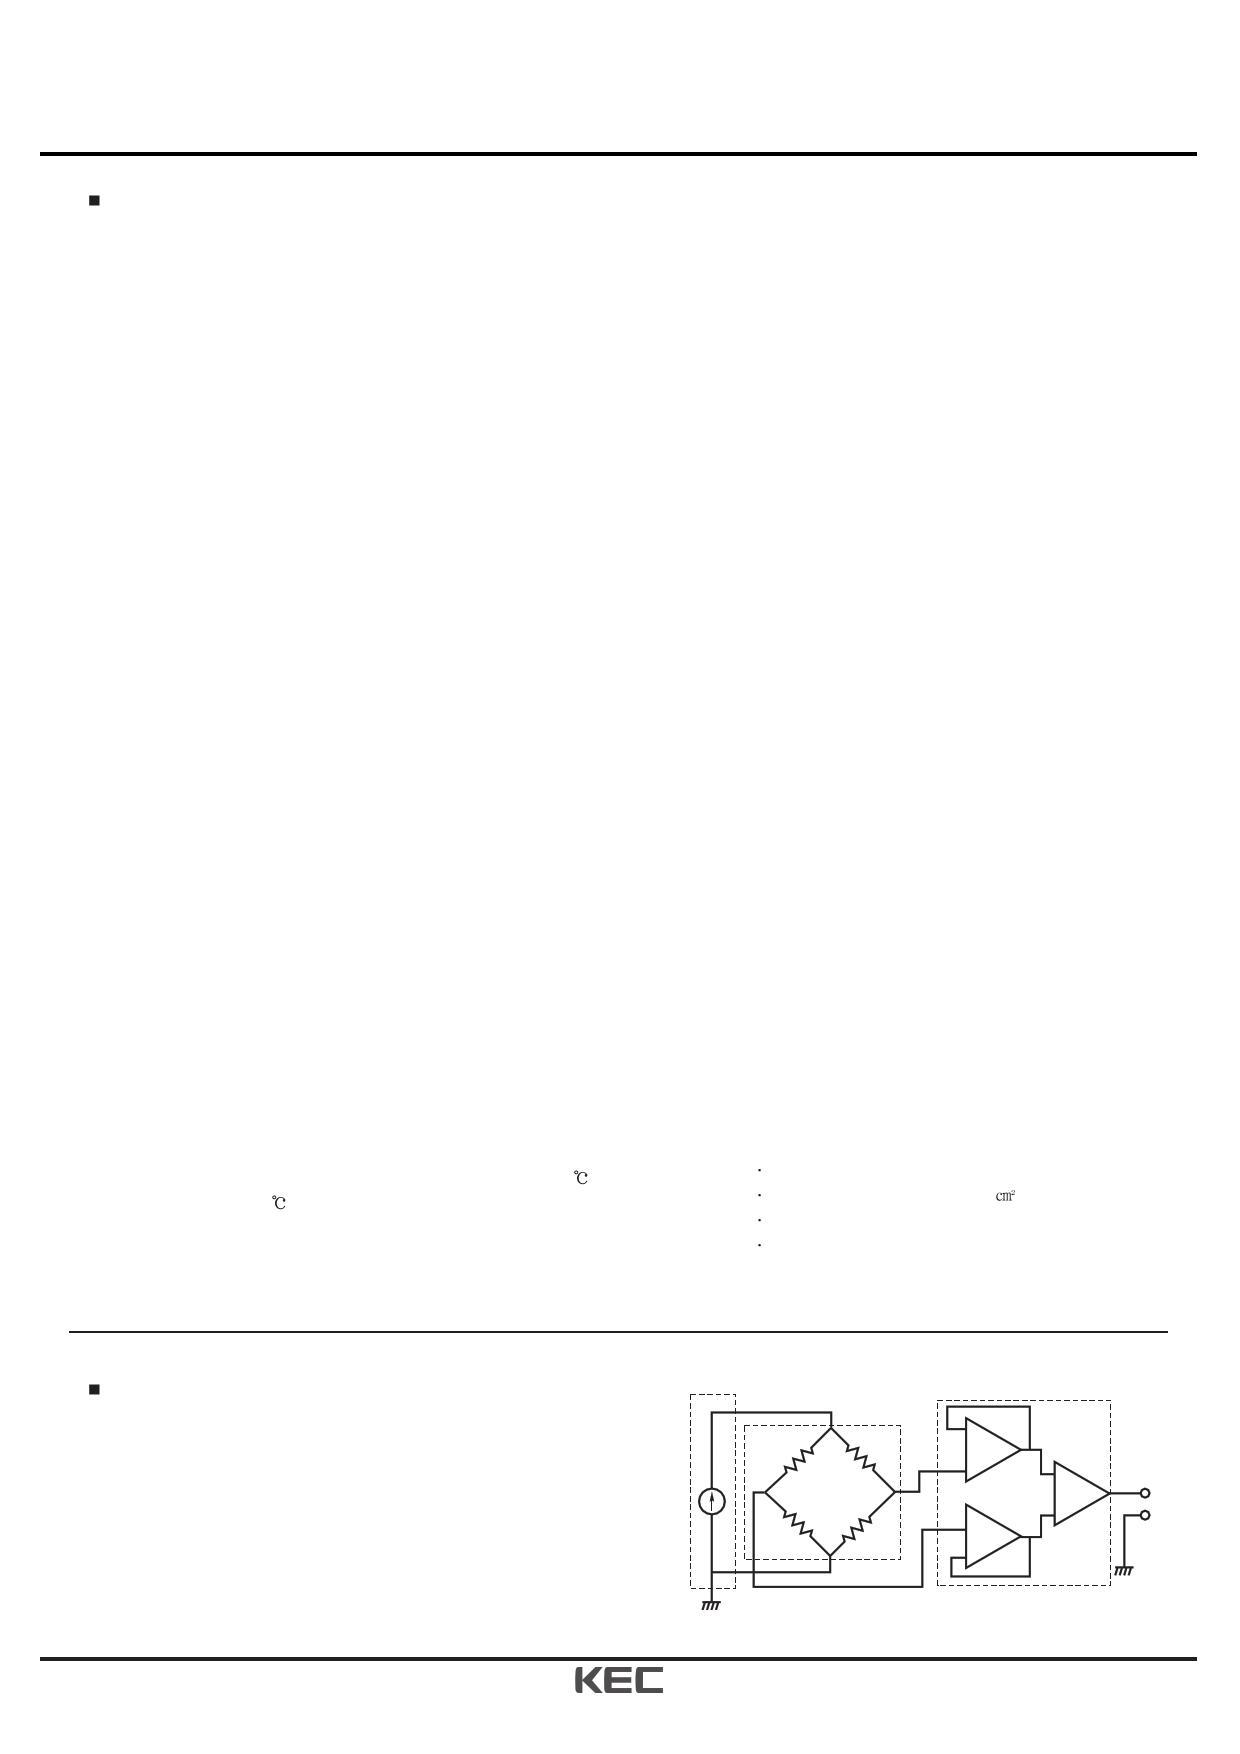 KPF500G03 pdf, 반도체, 판매, 대치품